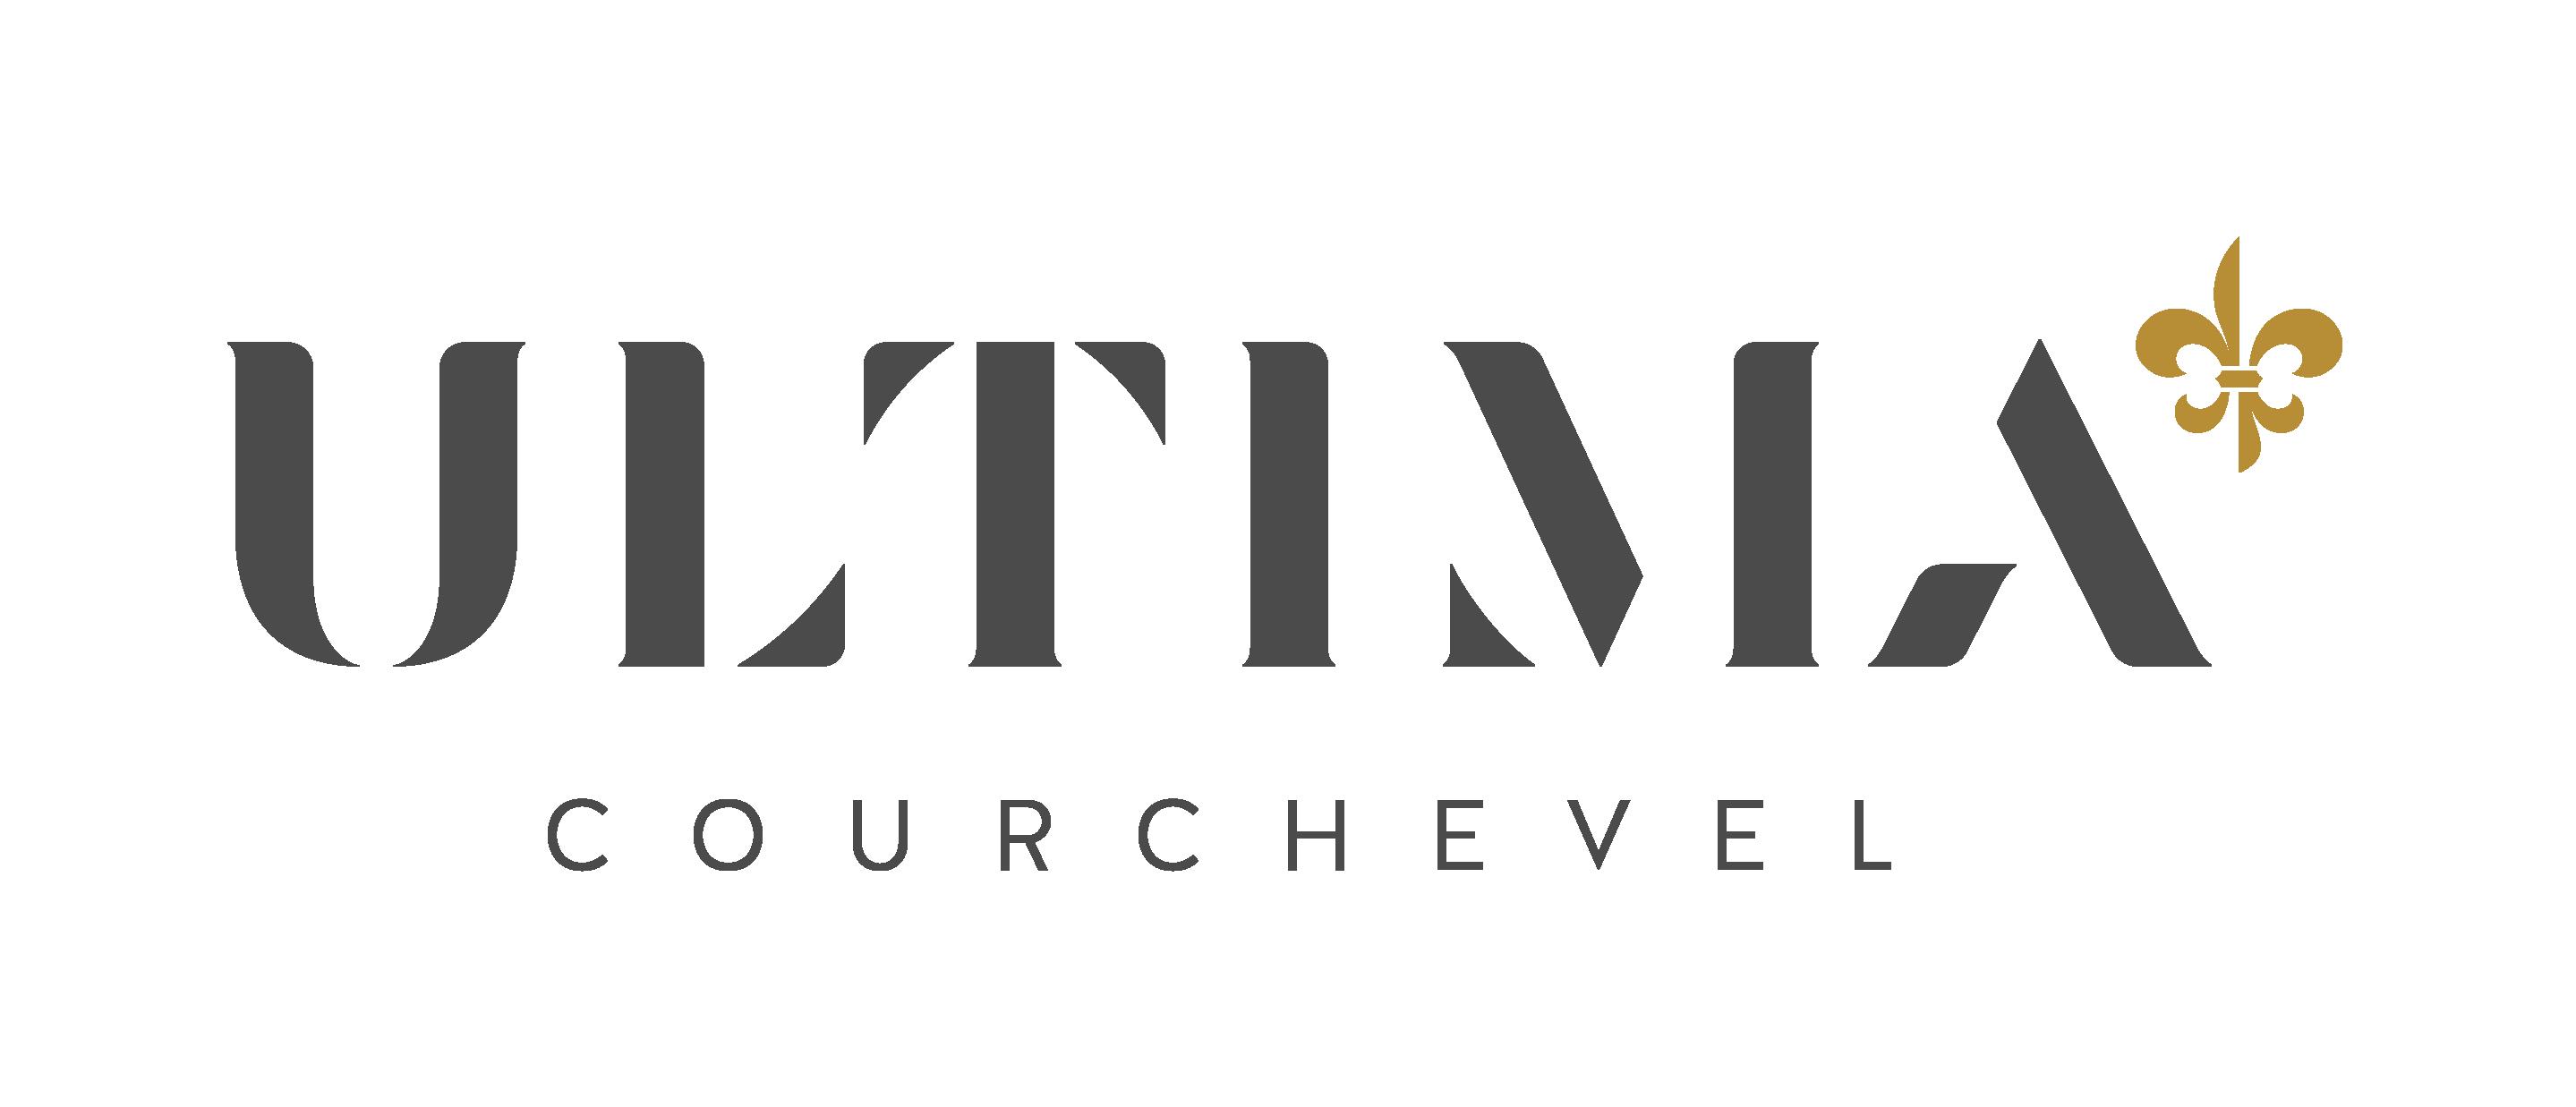 Ultima_Brand_Assets_RGB_WORDMARK_ULTIMA_COURCHEVEL_CHARCOAL